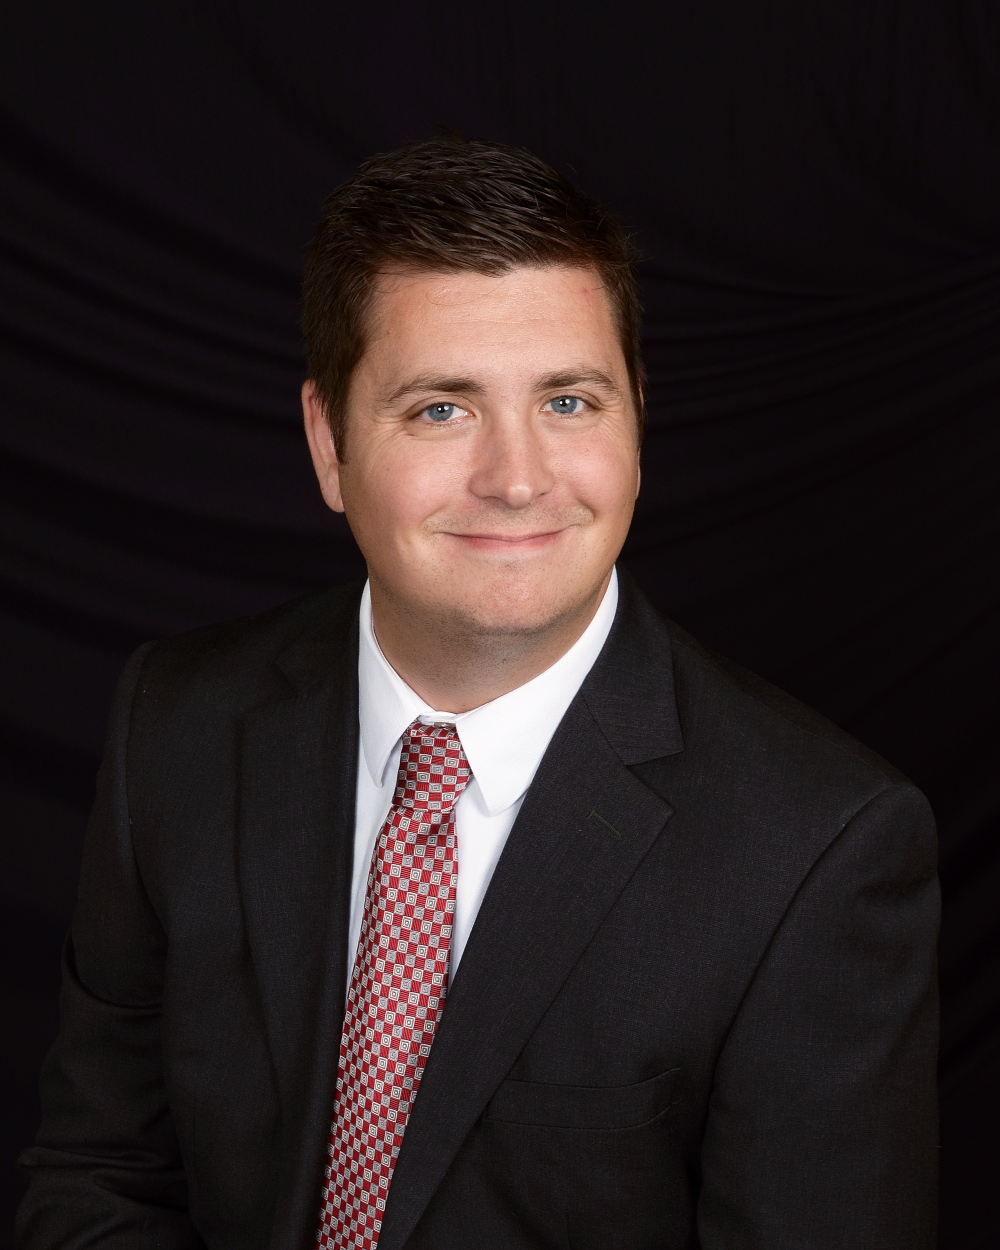 Senior Pastor Chris Guffey